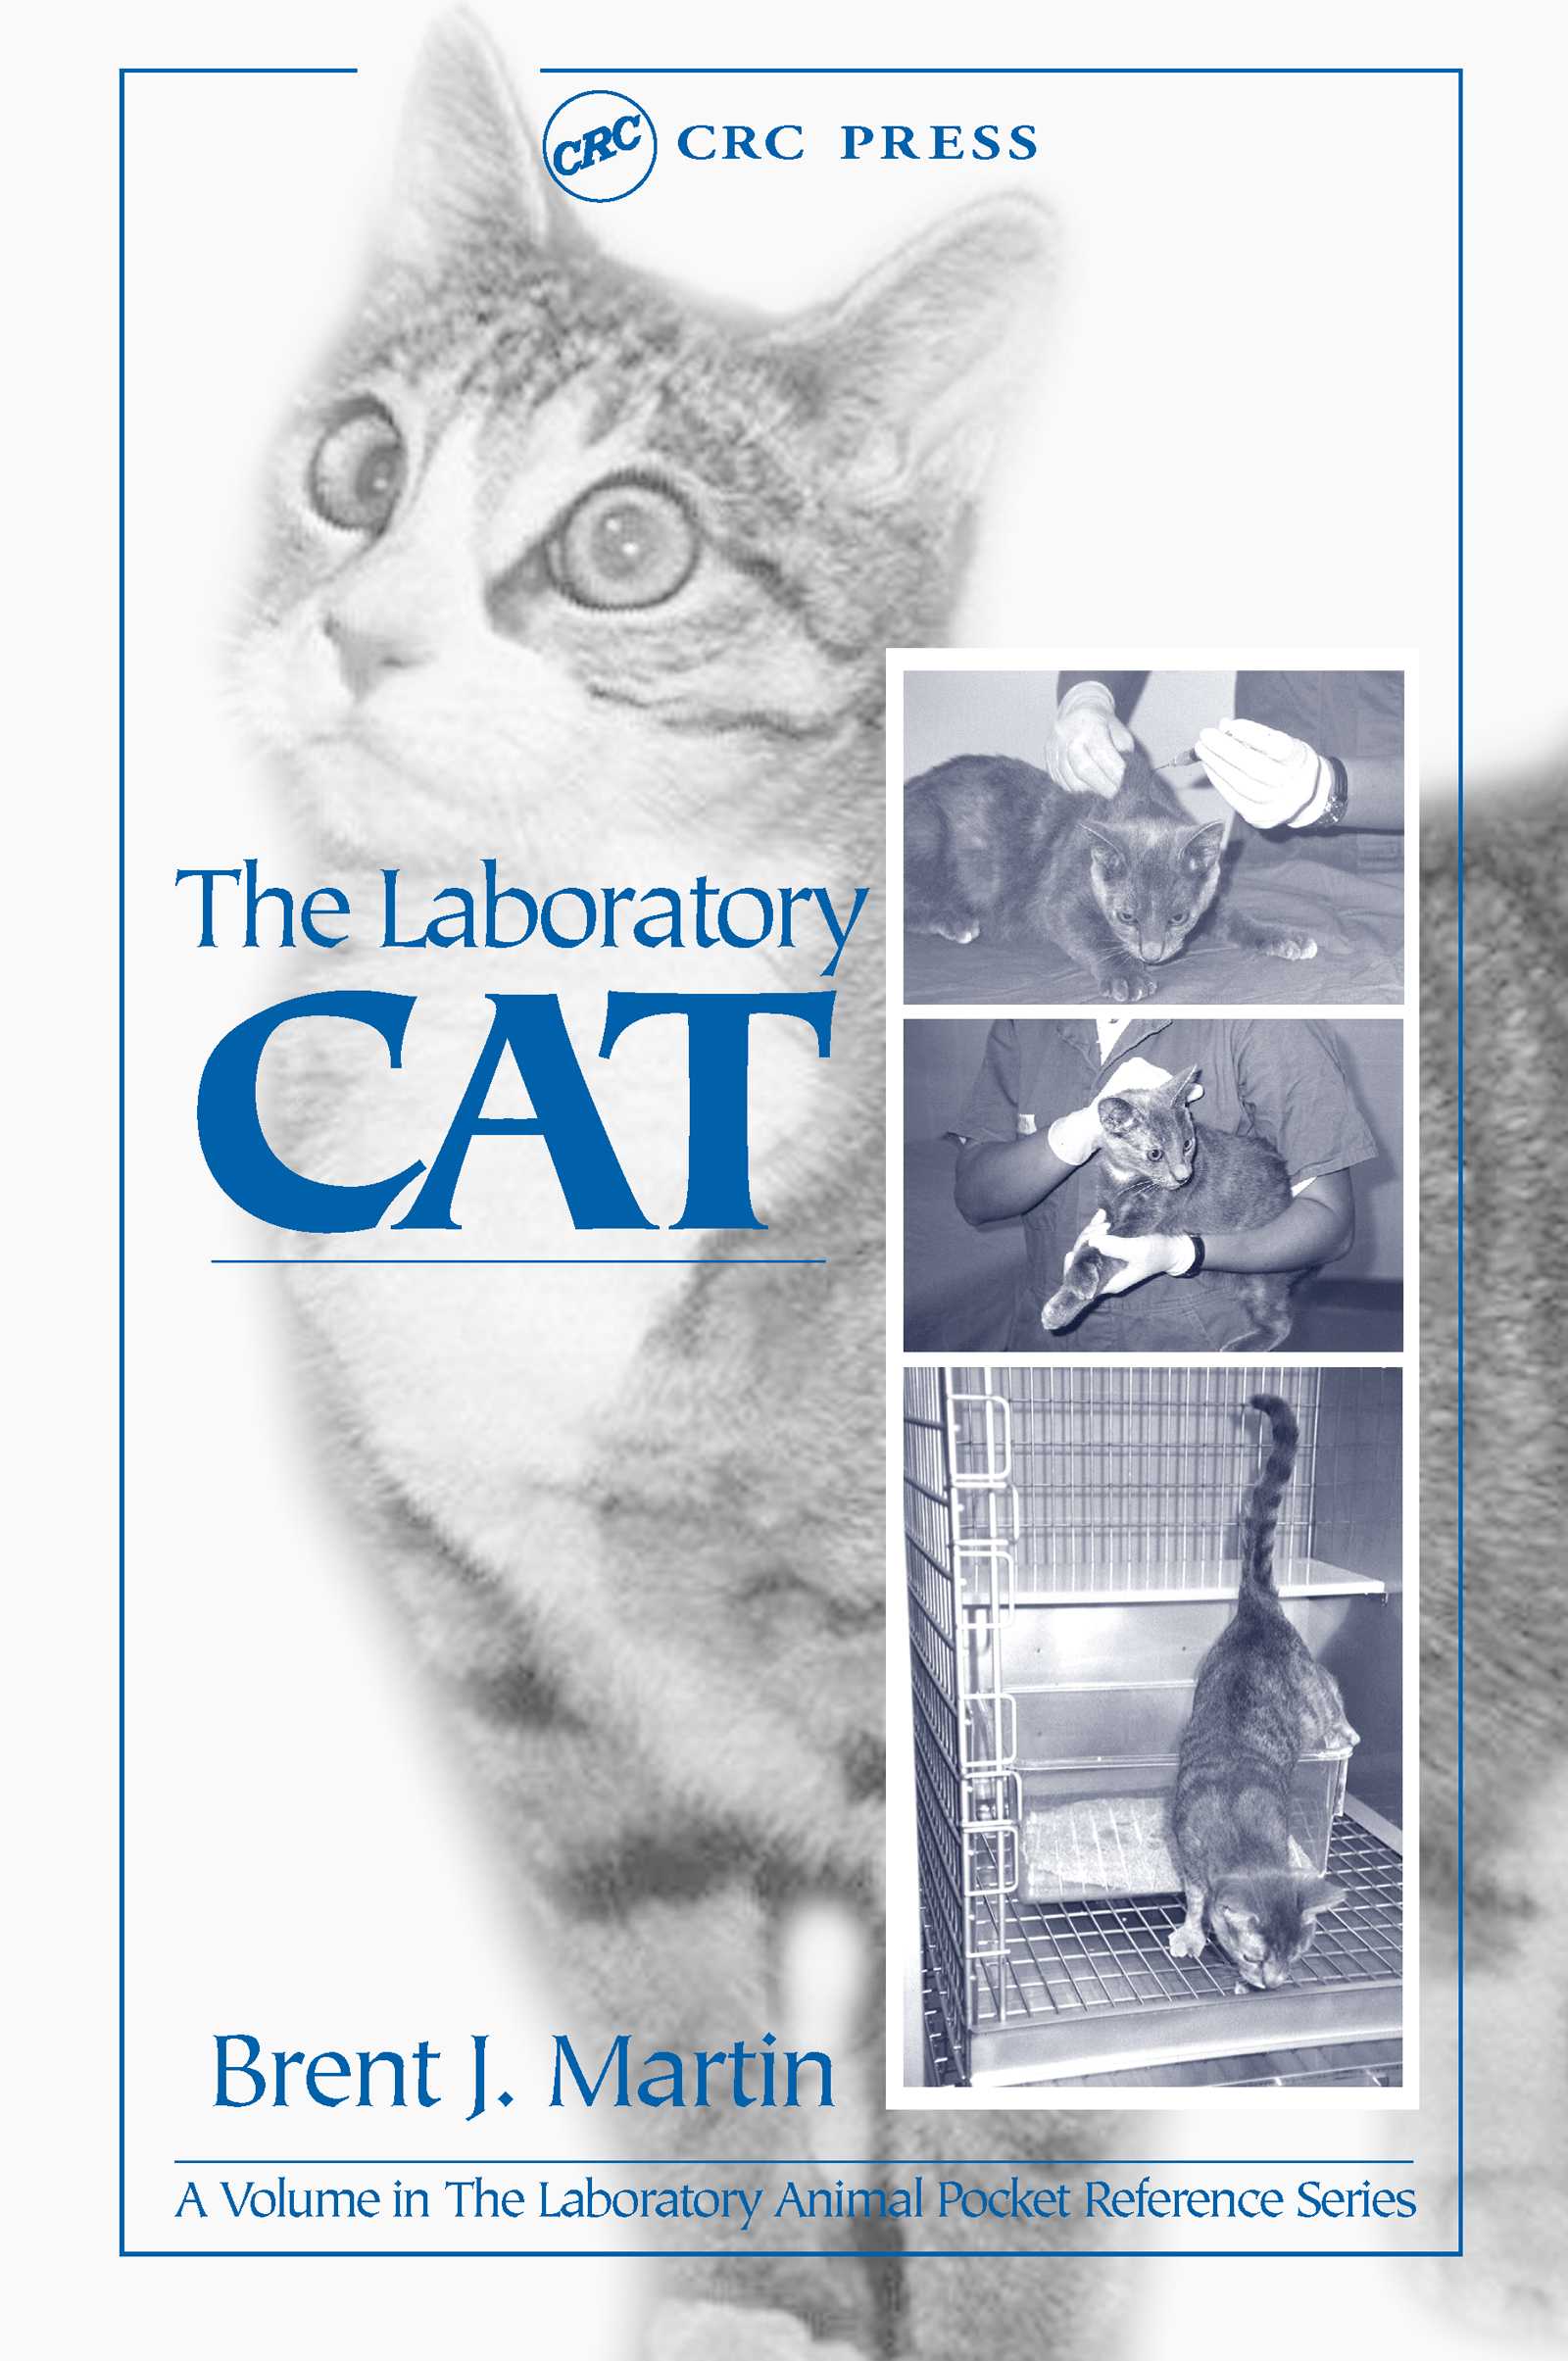 The Laboratory Cat book cover